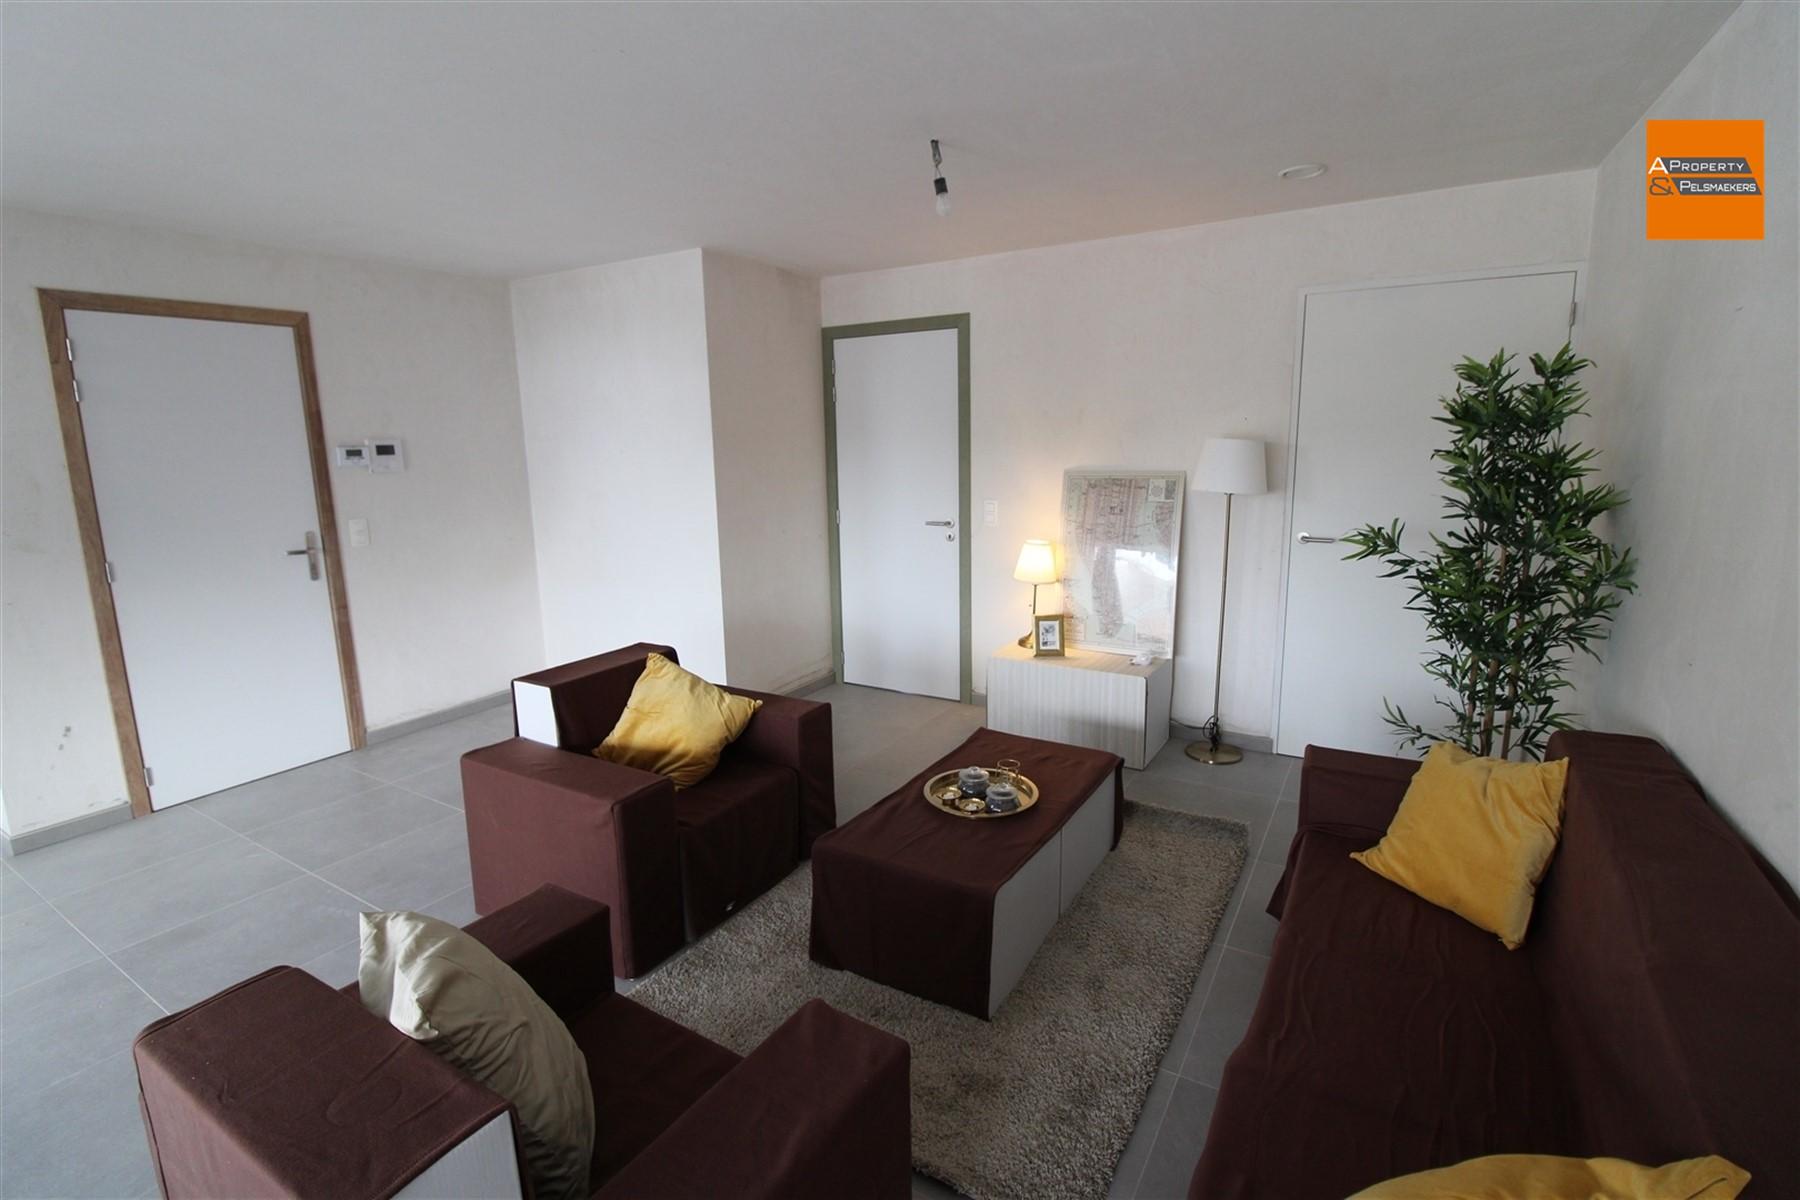 Foto 5 : Appartement in 3060 BERTEM (België) - Prijs € 319.000